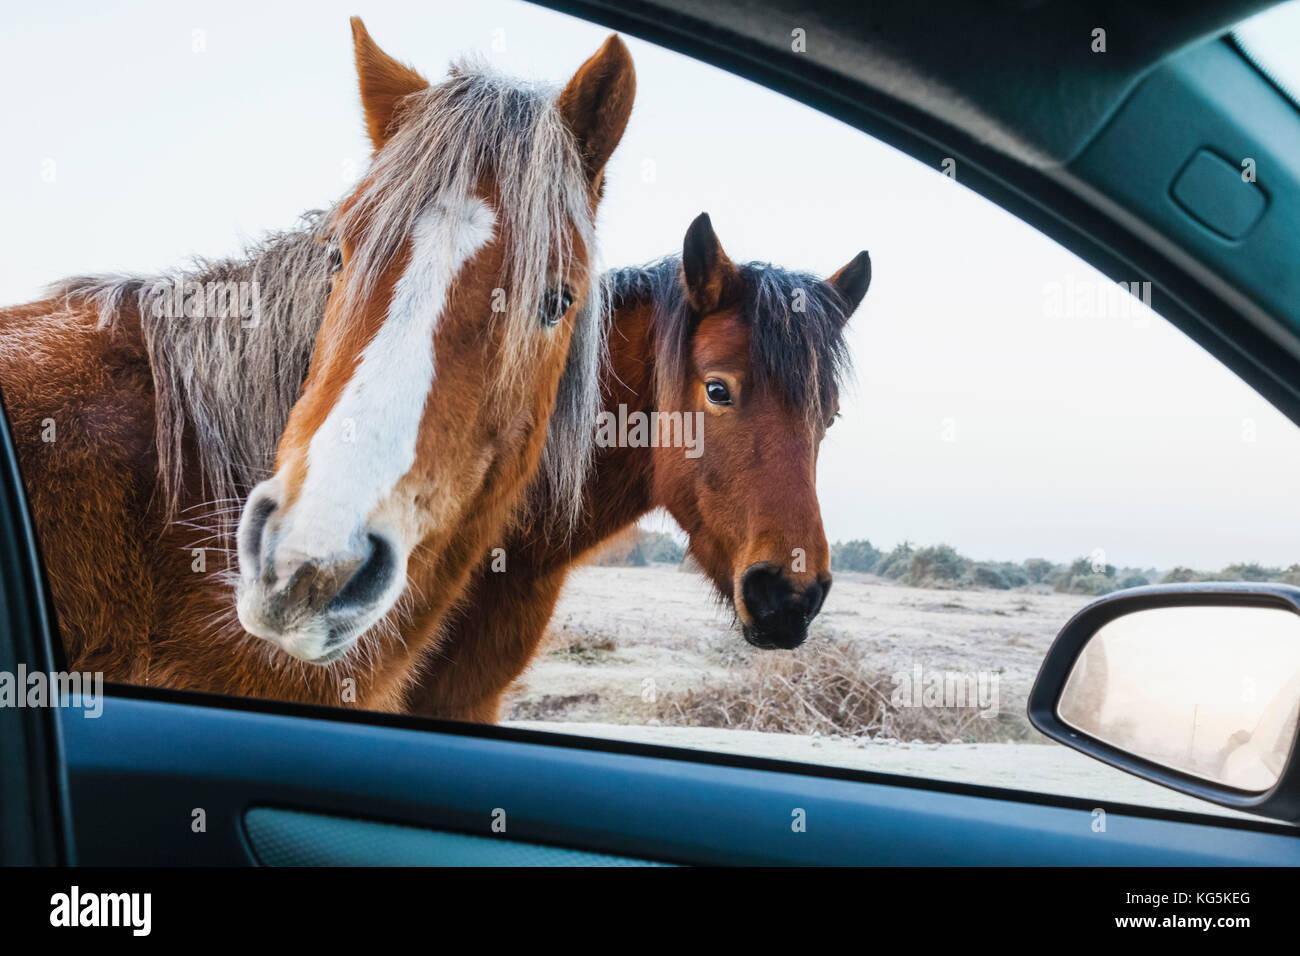 Inglaterra, Hampshire, New Forest, potros mirando a car window Imagen De Stock